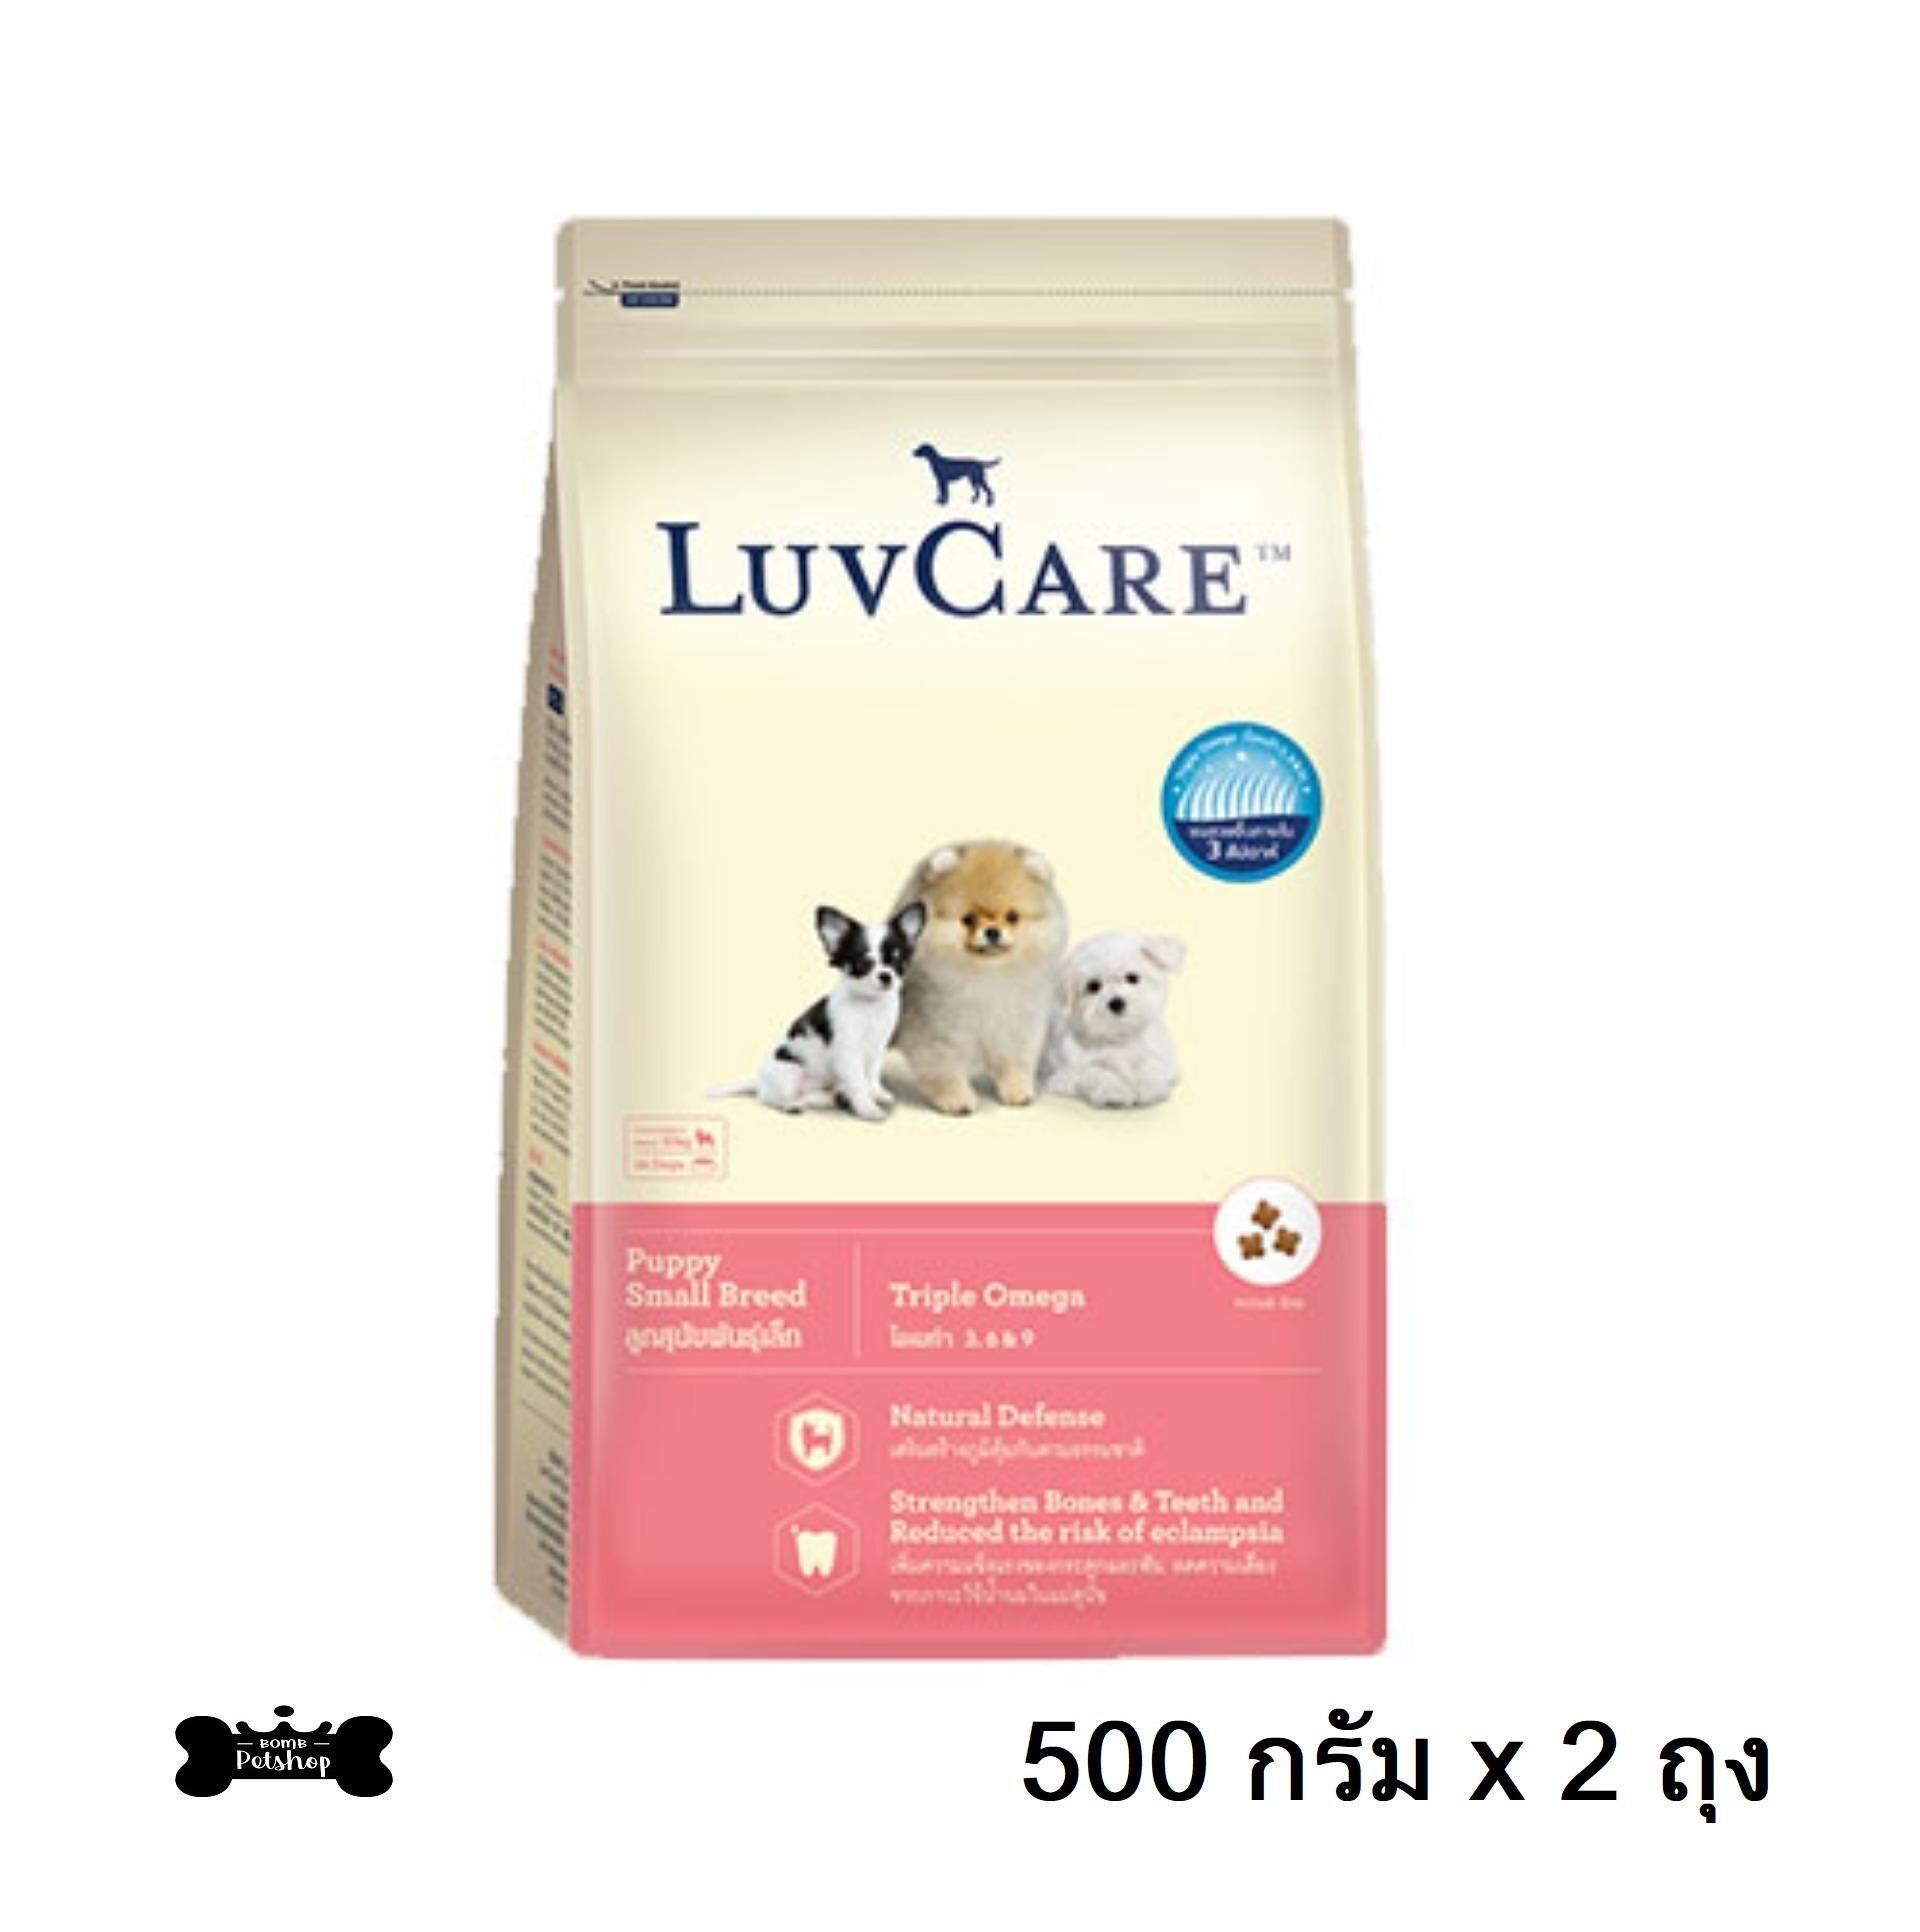 Dr.luvcare Puppy Small Breed Dog Food เลิฟแคร์ อาหารลูกสุนัข แบบเม็ด พันธุ์เล็ก ขนาดเล็ก ขนาด 500 G X 2 ถุง.